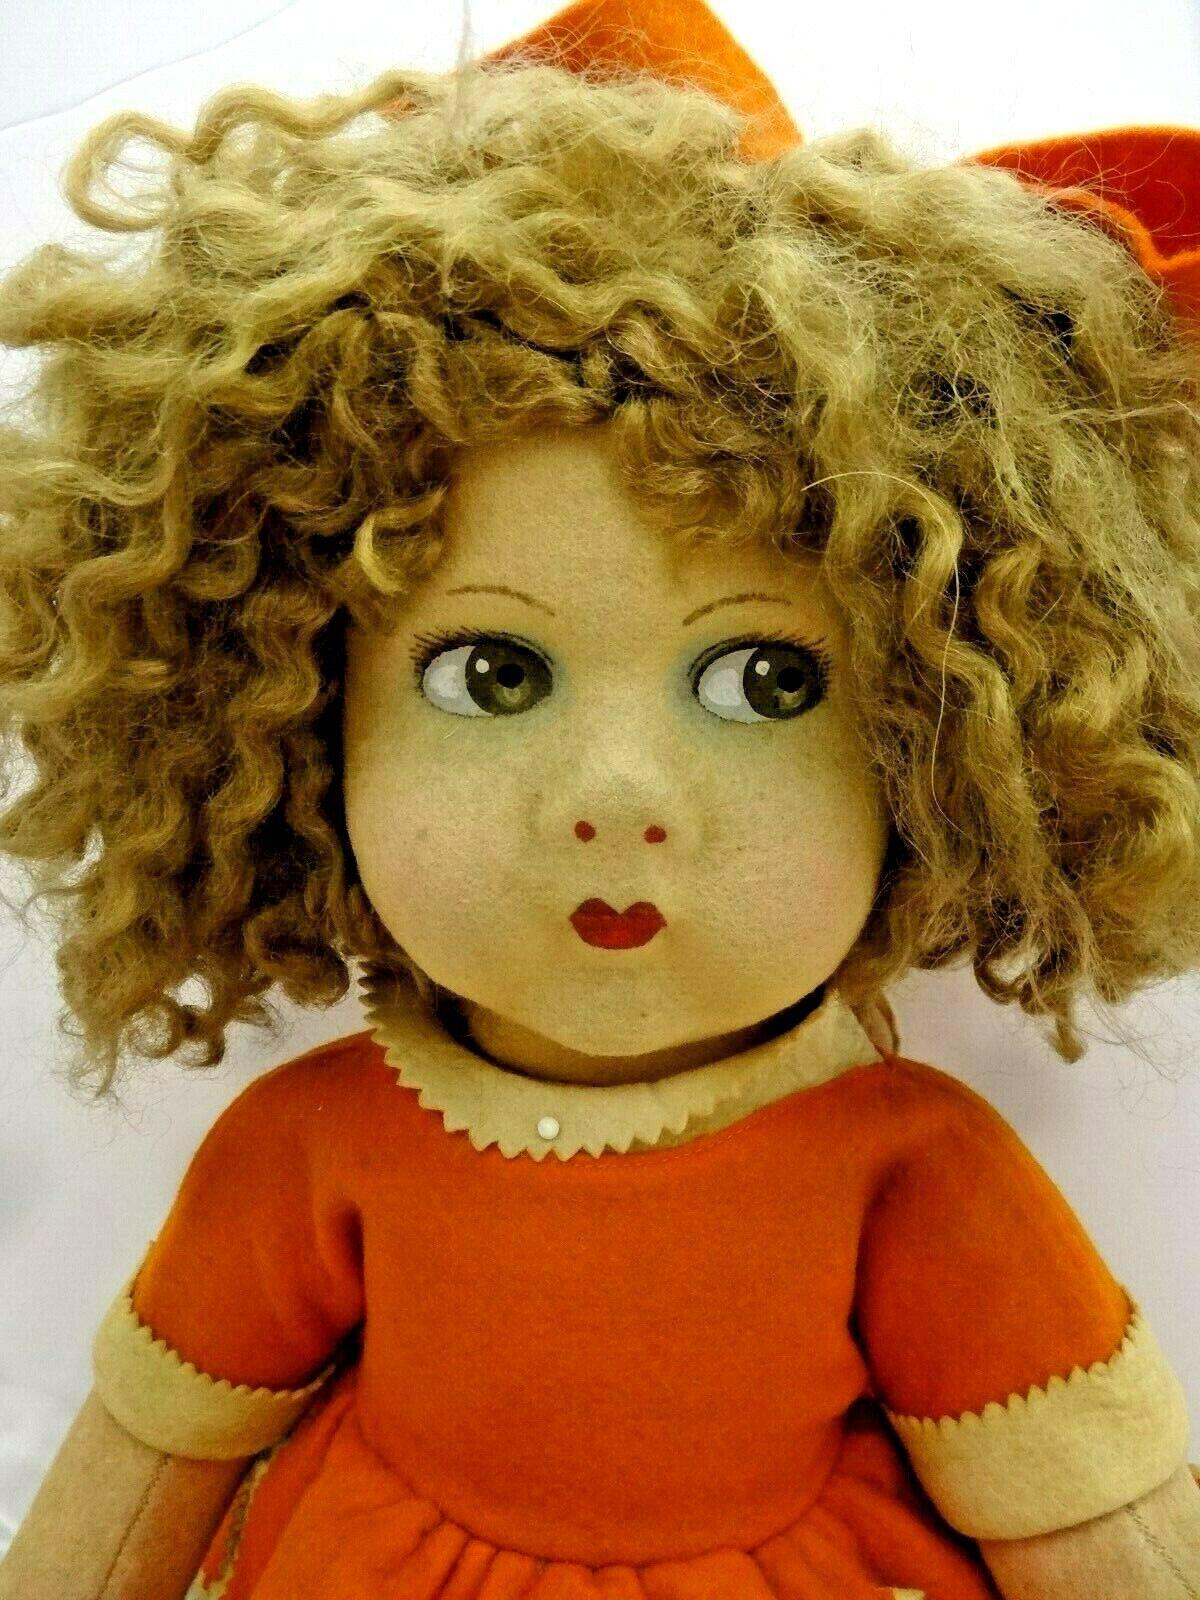 Vintage Lenci Style 22  Doll - Crazy Hair, Comical Doll